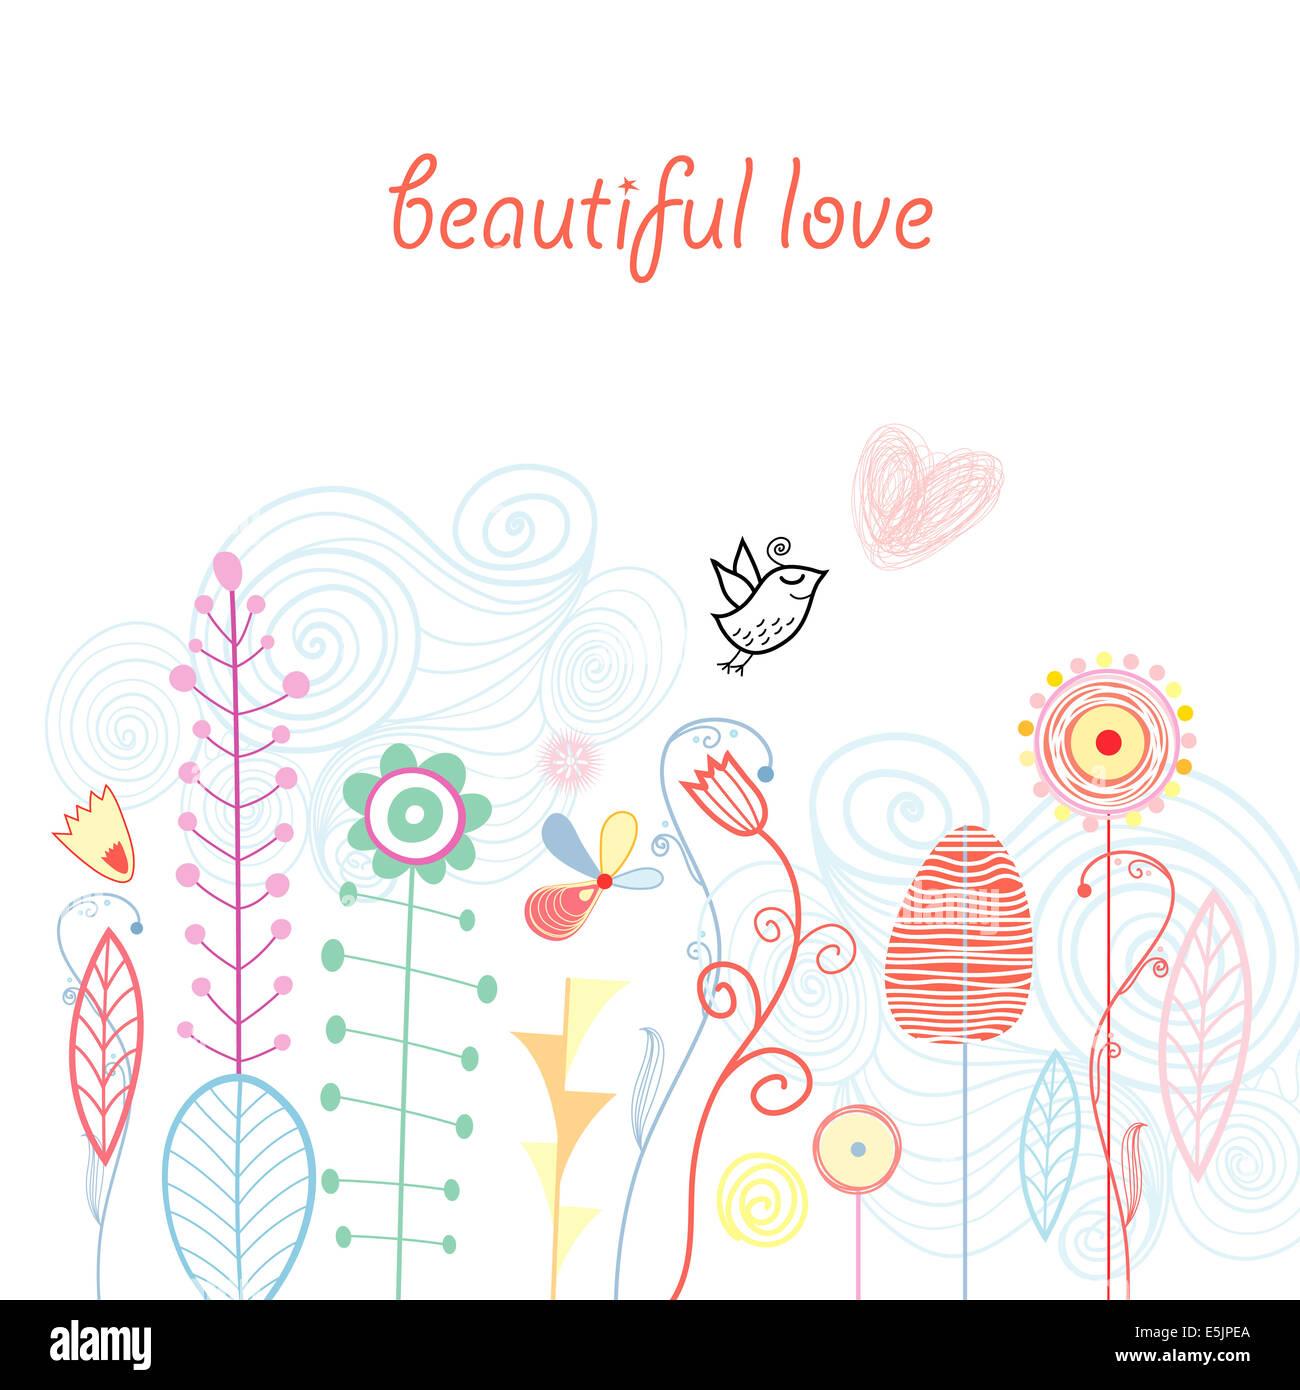 Beautiful designs flowers birds stock photos beautiful designs beautiful designs of flowers and birds stock image izmirmasajfo